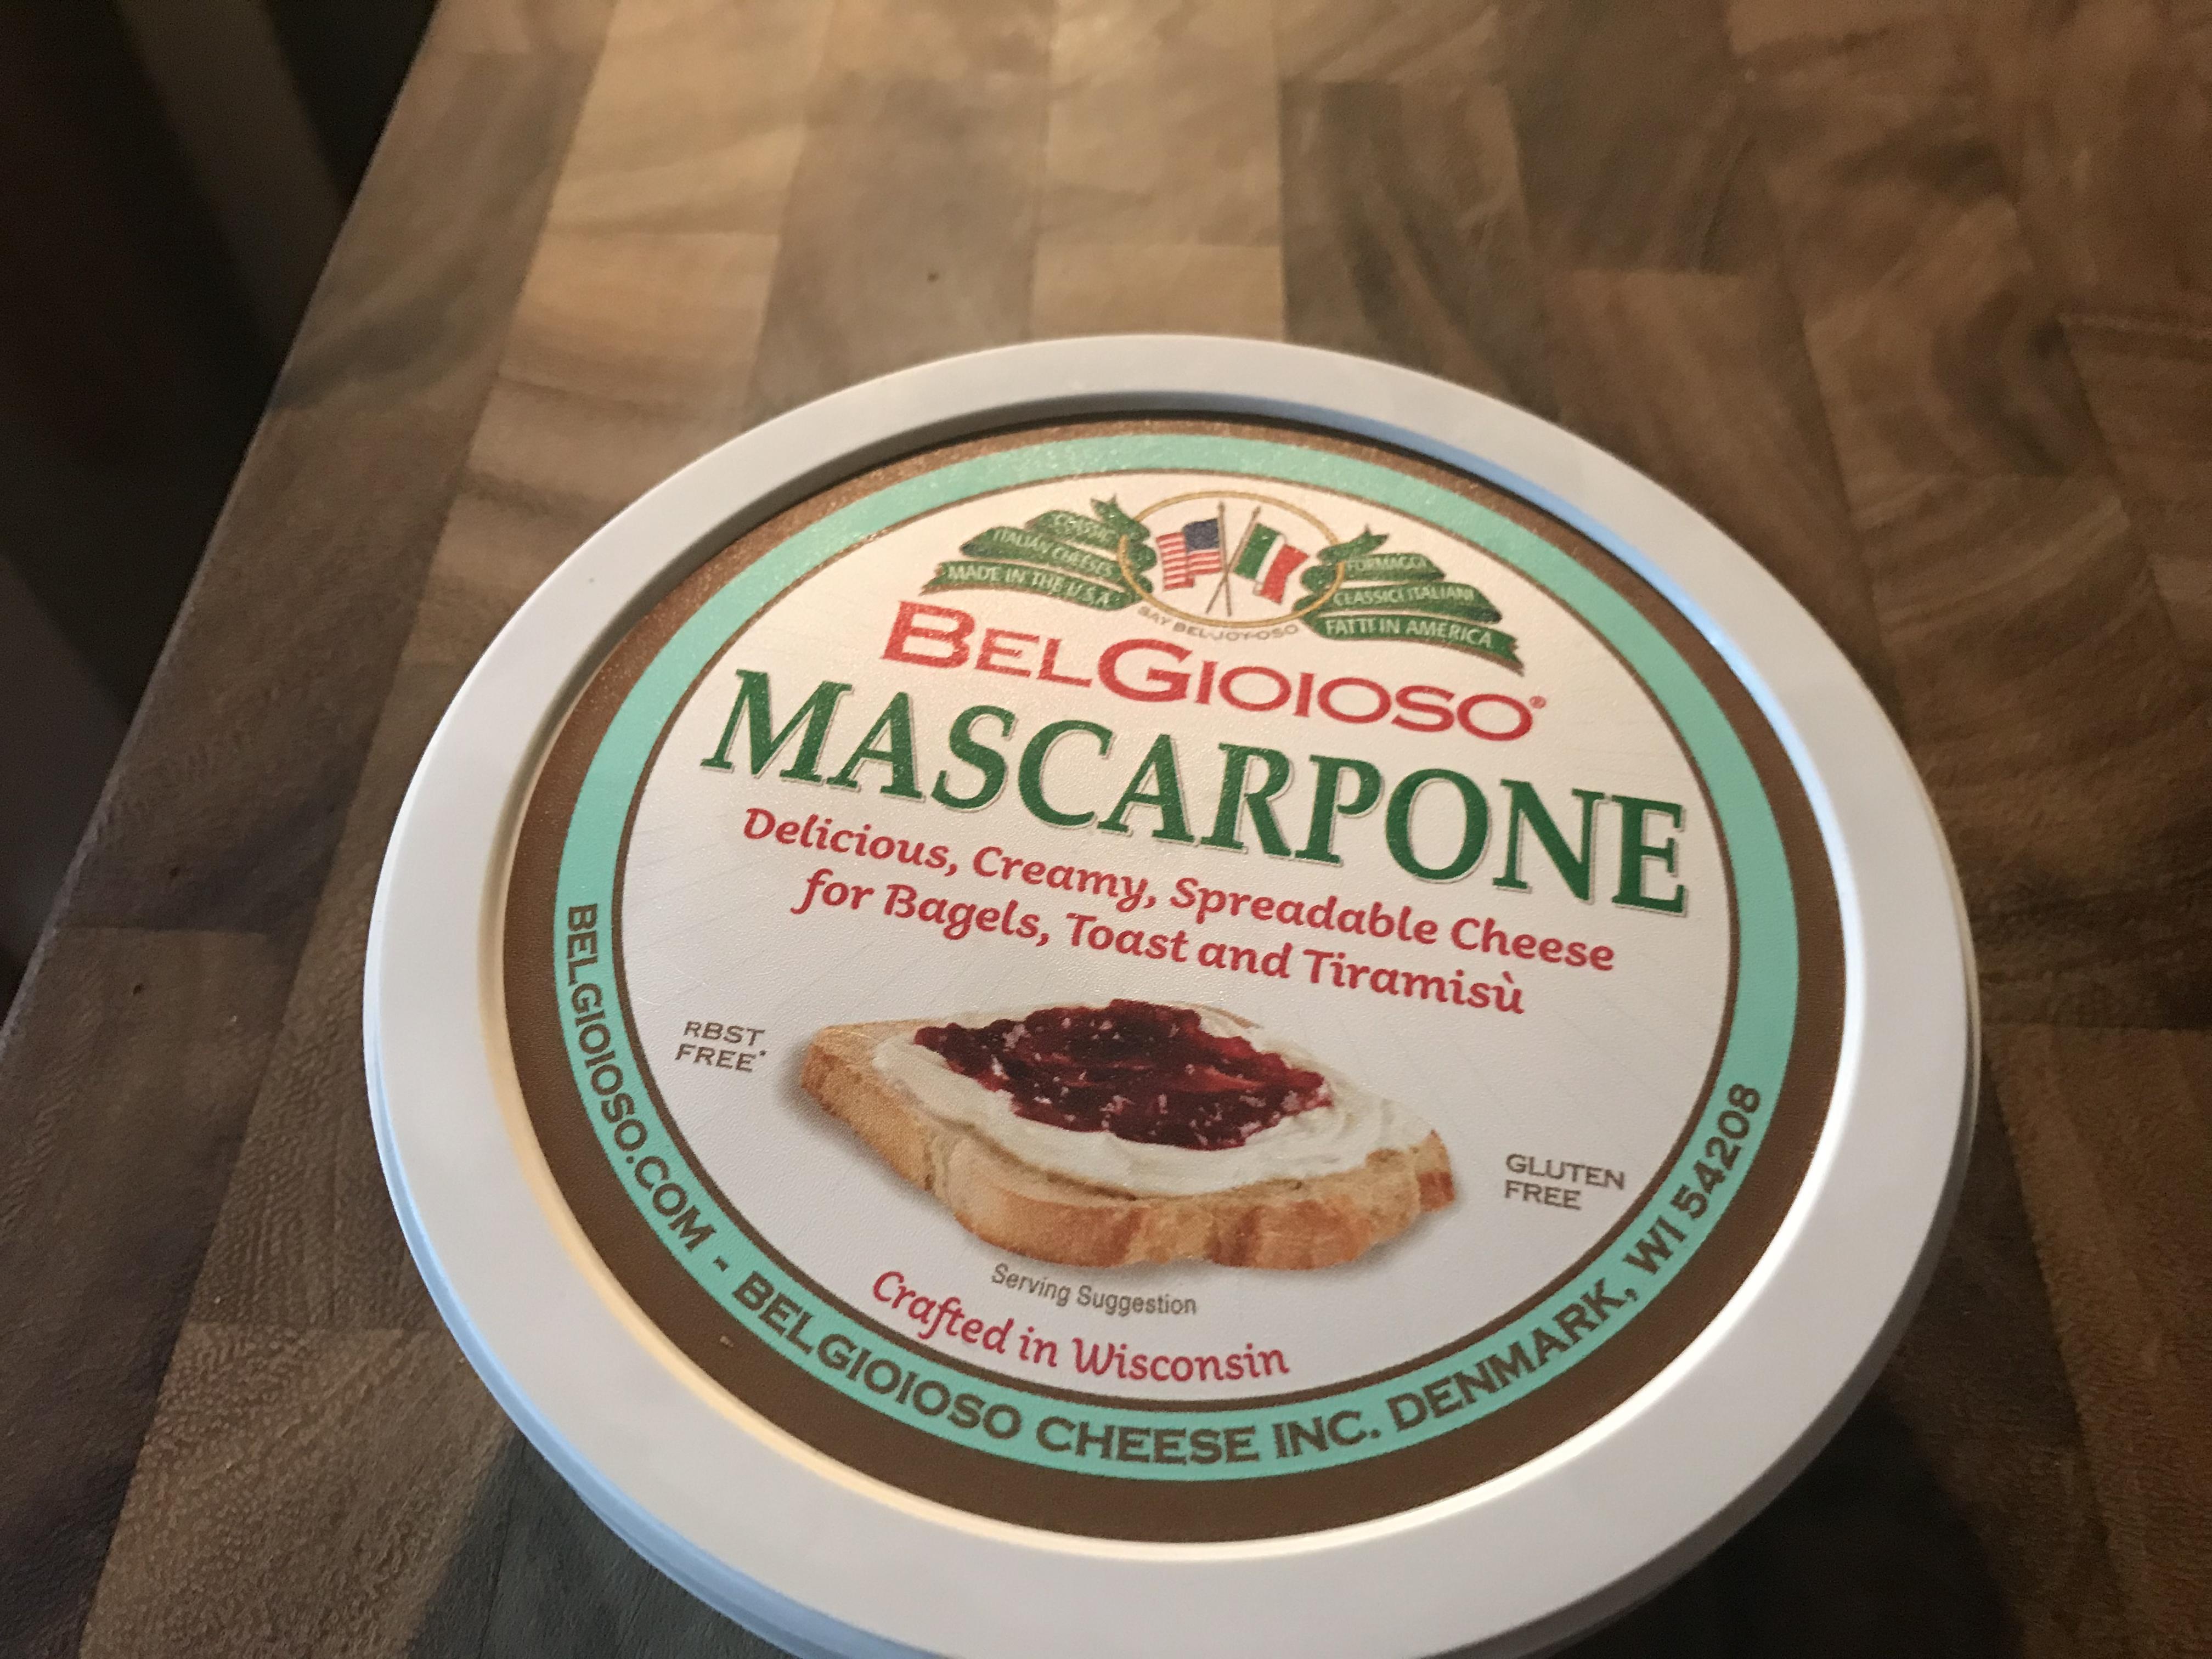 Mascarpone Cheese